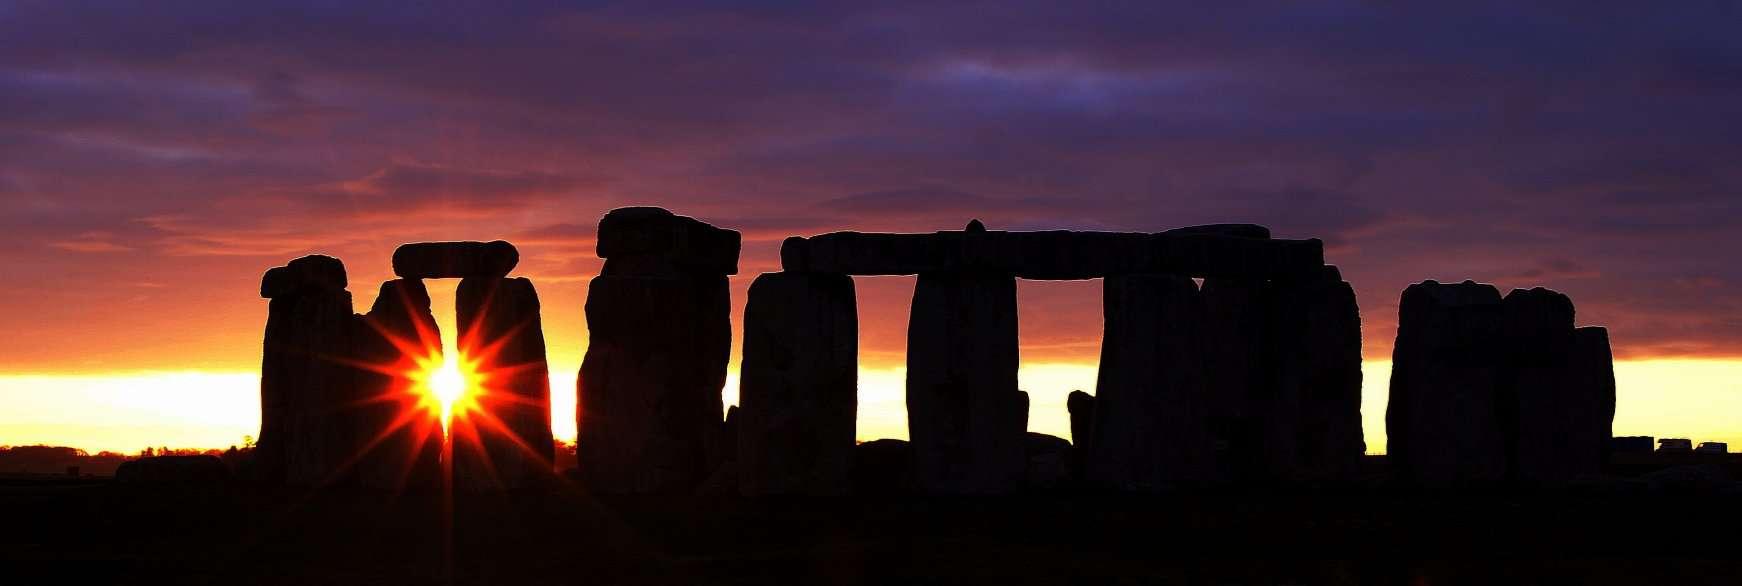 Winter Solstice at Stonehenge - Peter Trimming via Flickr